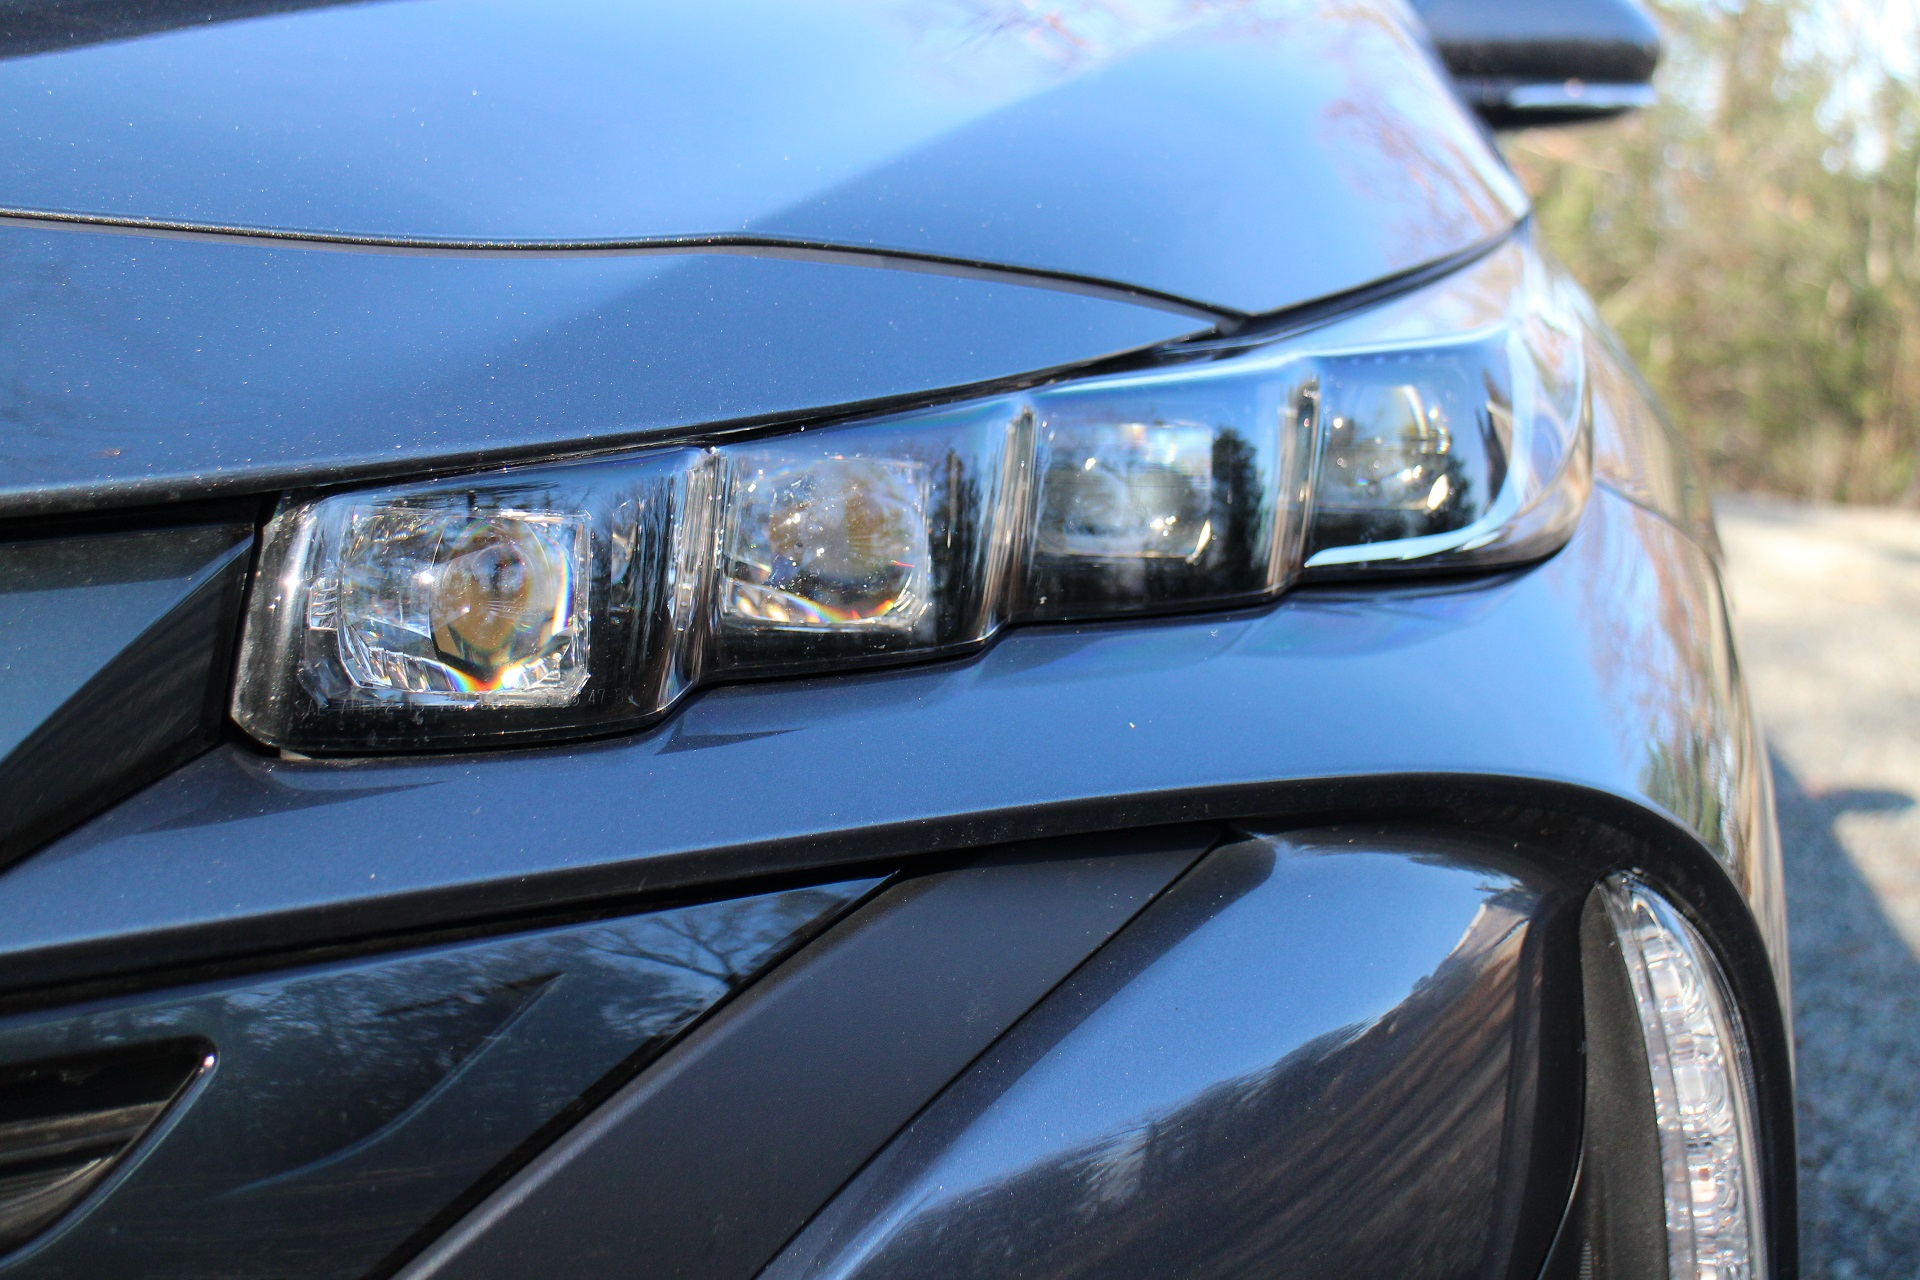 hybrid sales, coal in china, panasonic loves tesla: today's car news